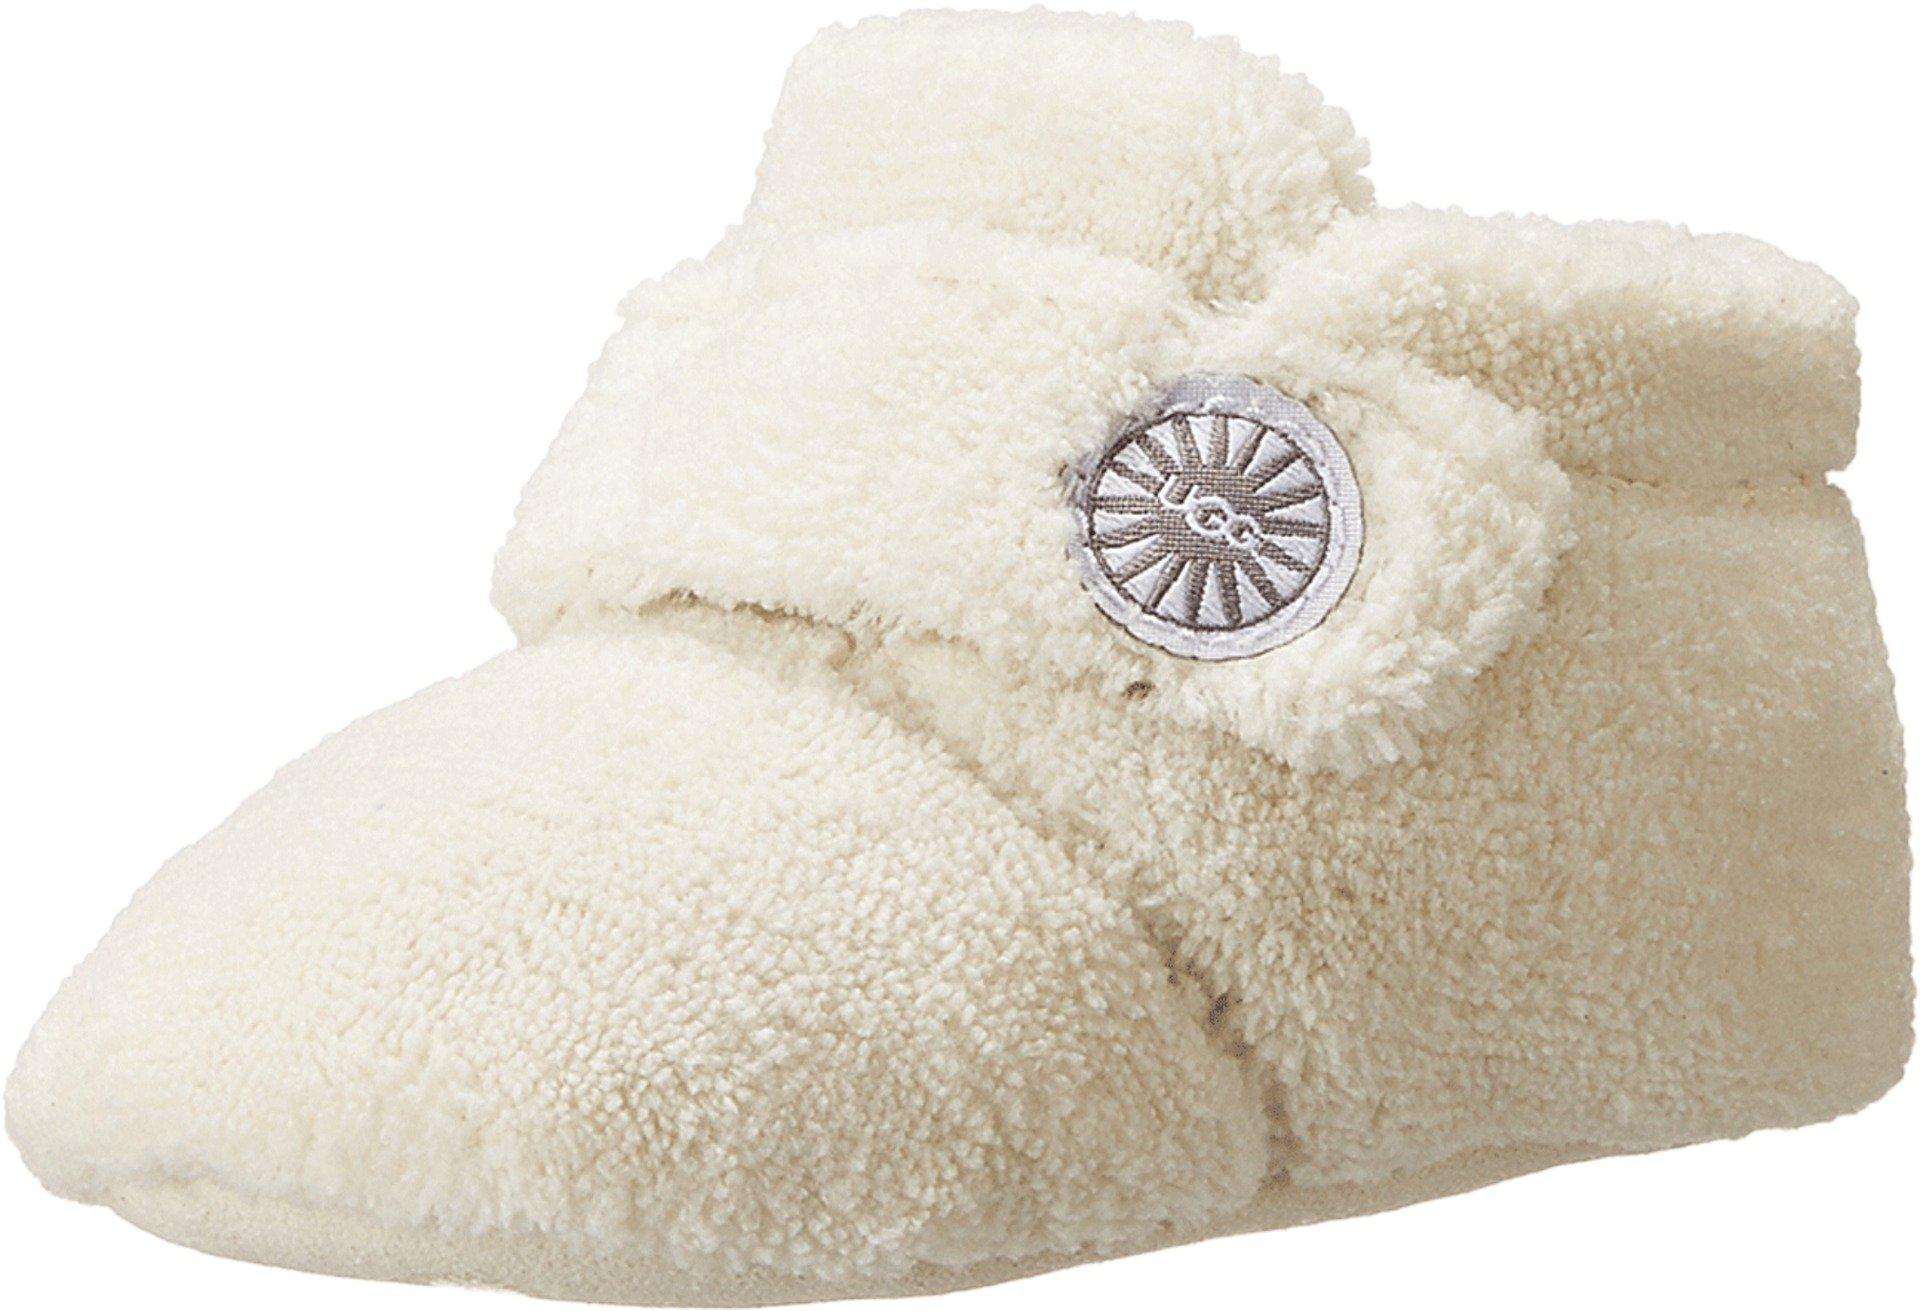 UGG Unisex Bixbee Bootie (Infant/Toddler), Vanilla, 2/3 (6-12 Months) M